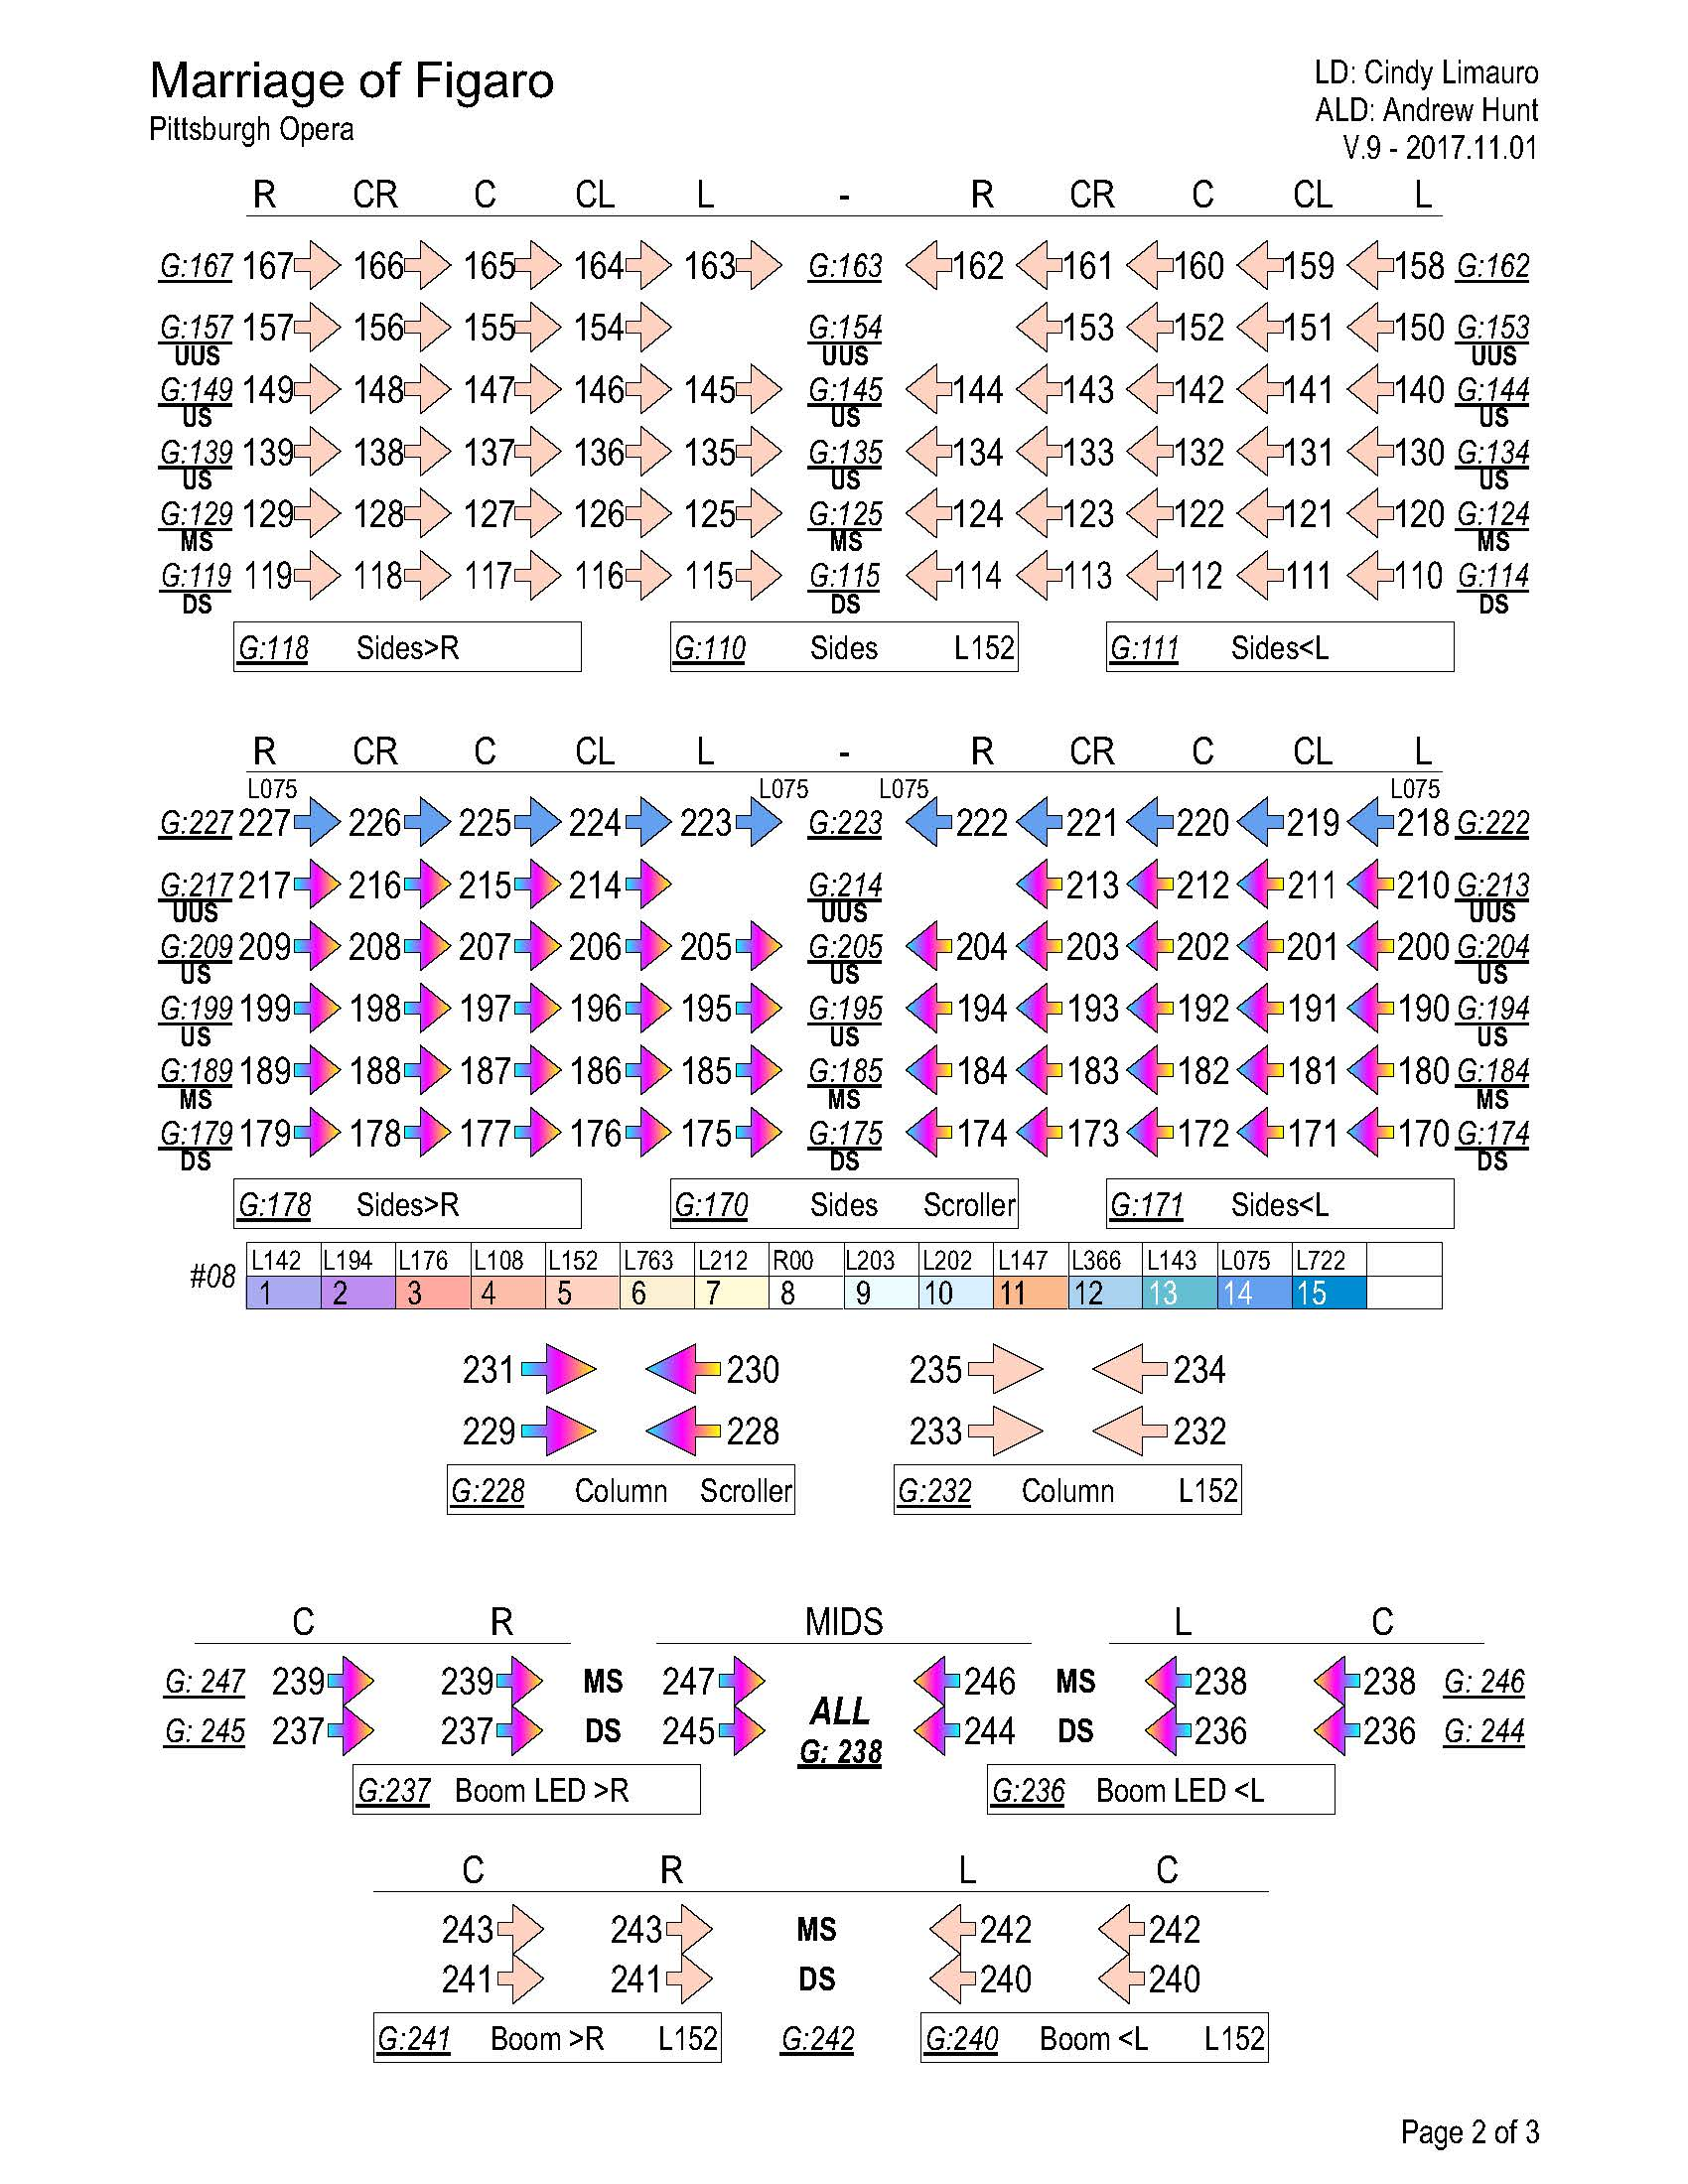 Figaro_Magic Sheet_2017.11.01_v9 FINAL_Page_2.jpg